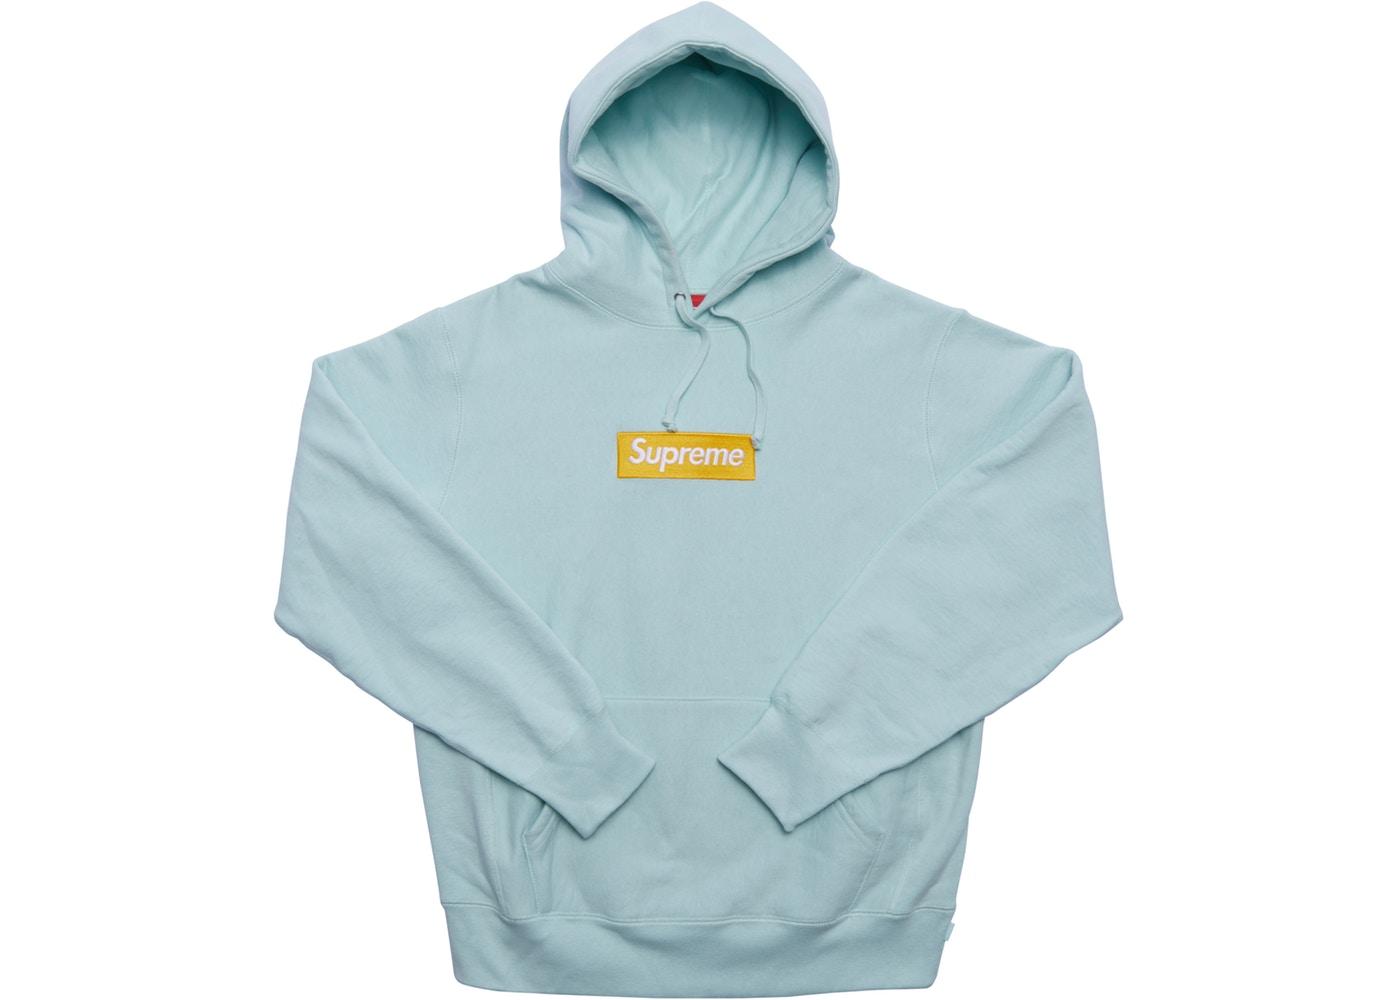 Supreme Box Logo Hooded Sweatshirt (FW17) Ice Blue.